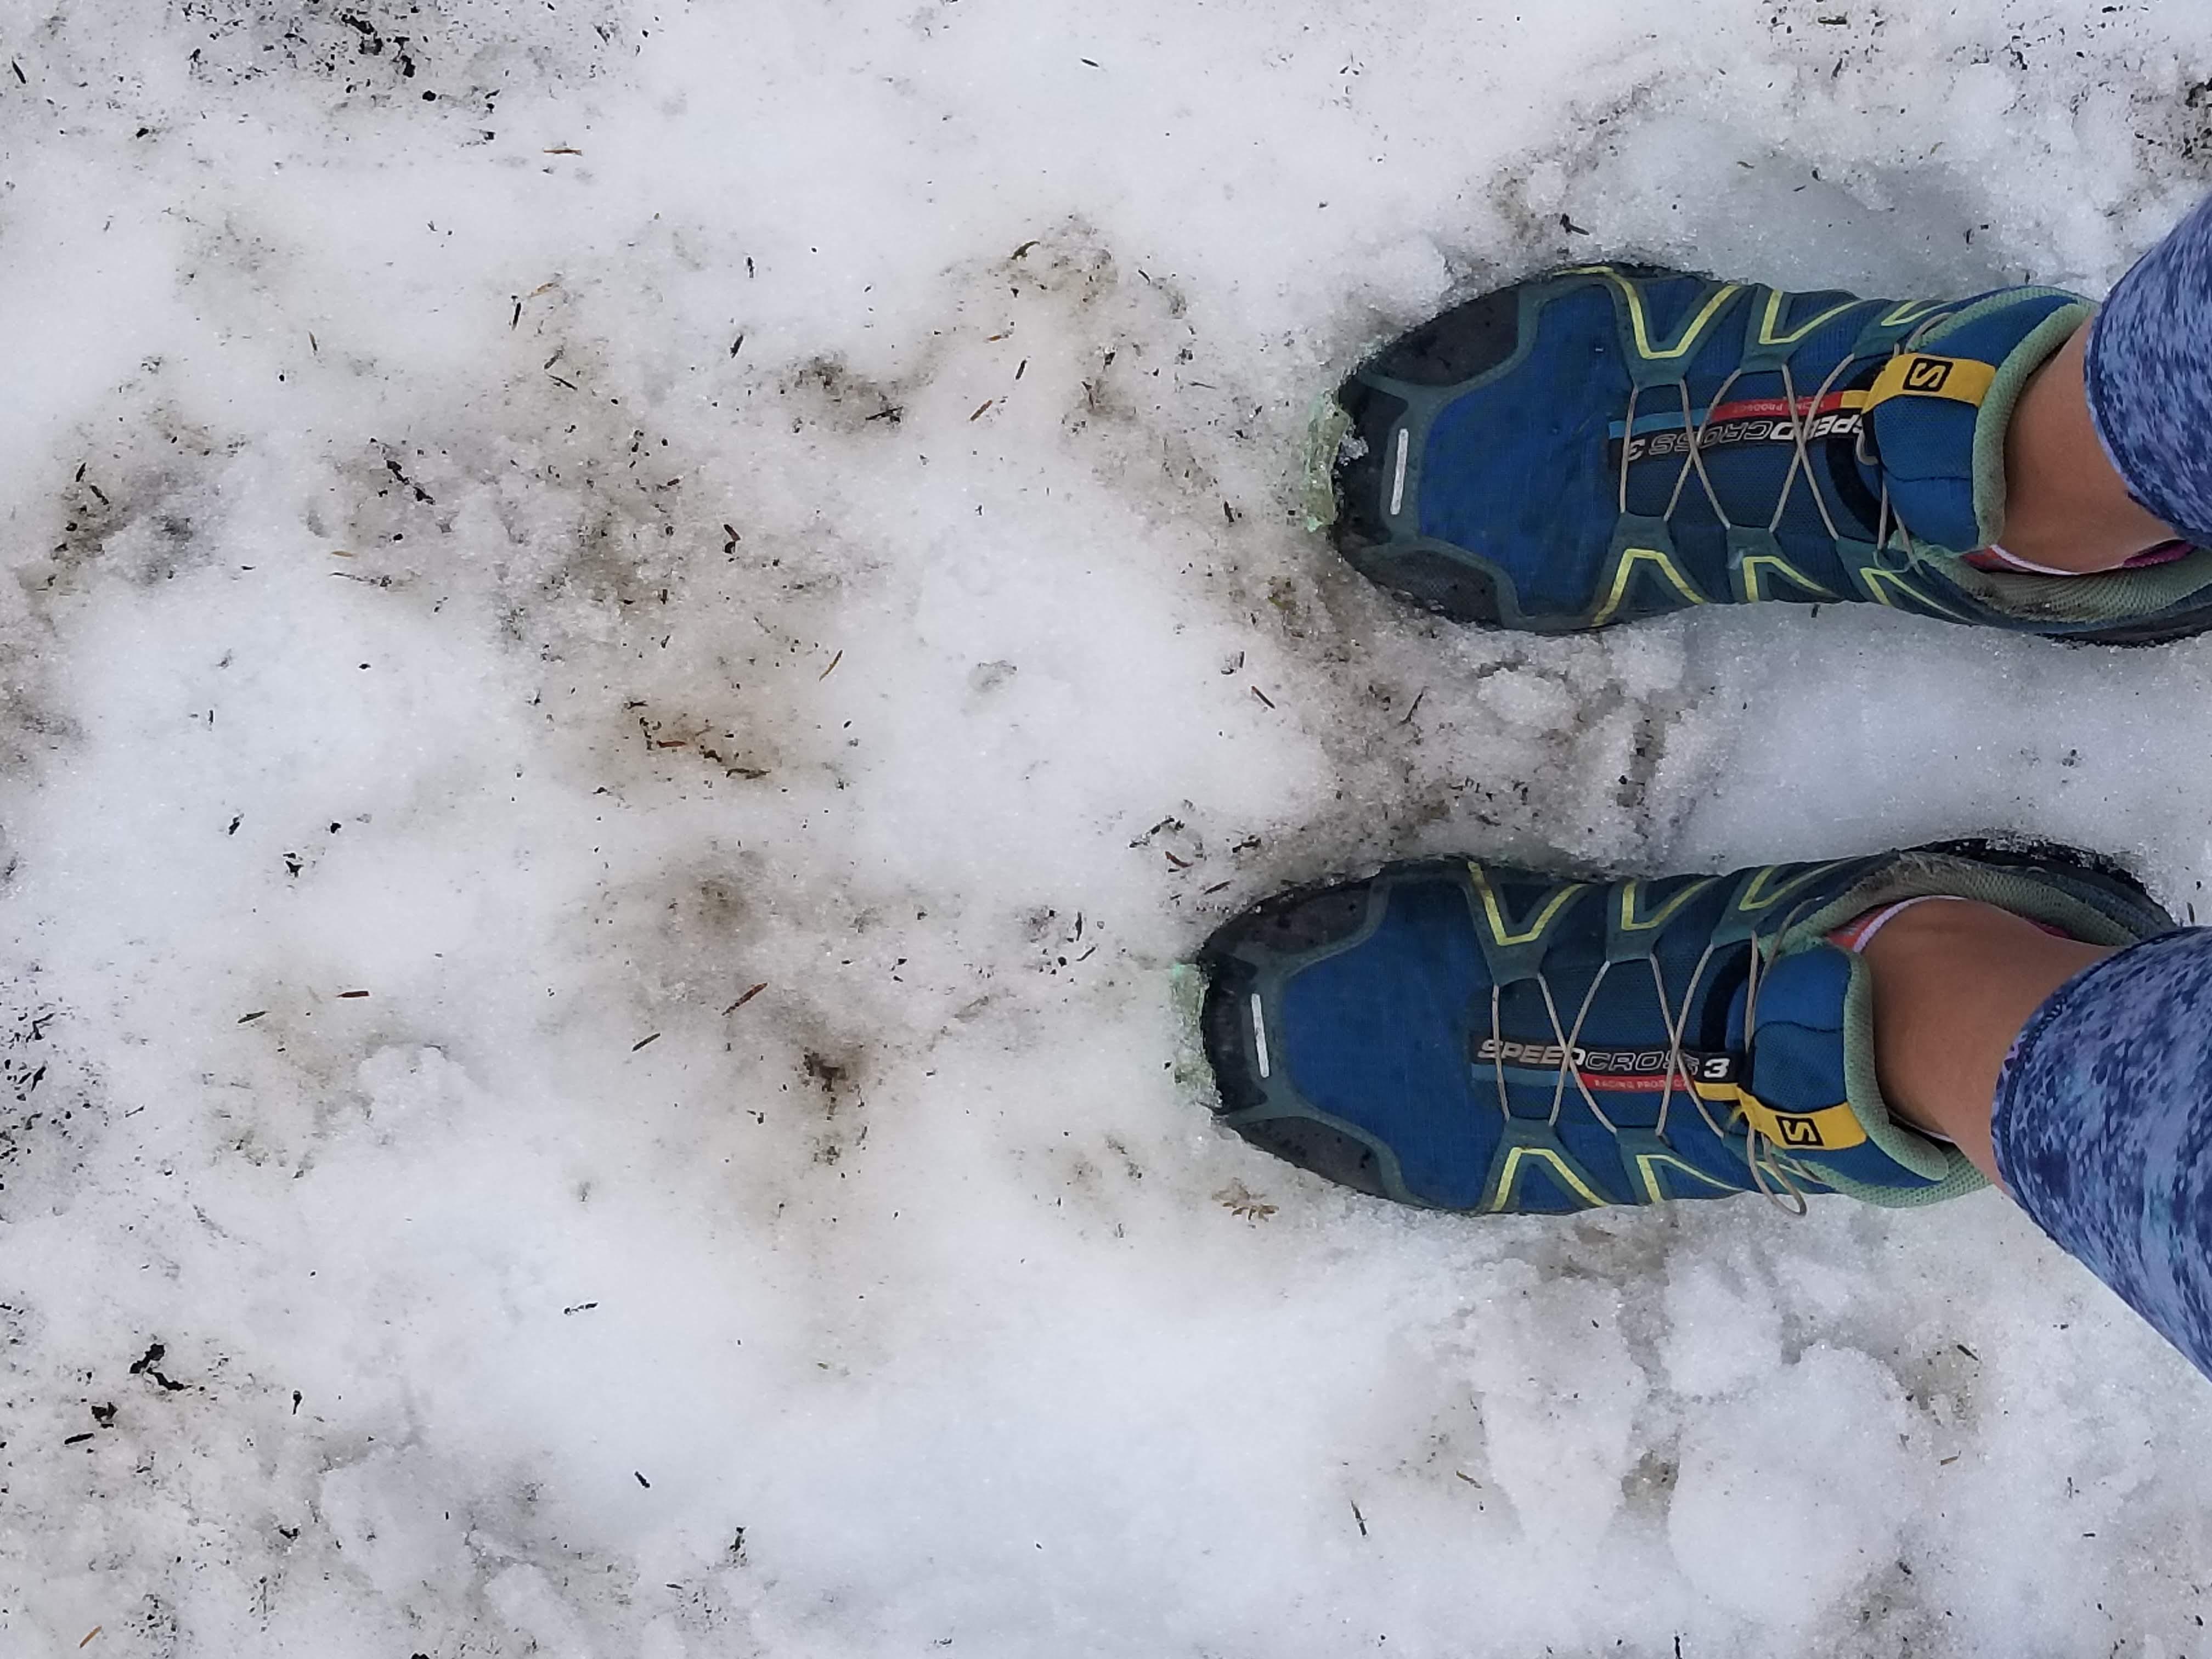 snow, hiking, trail running